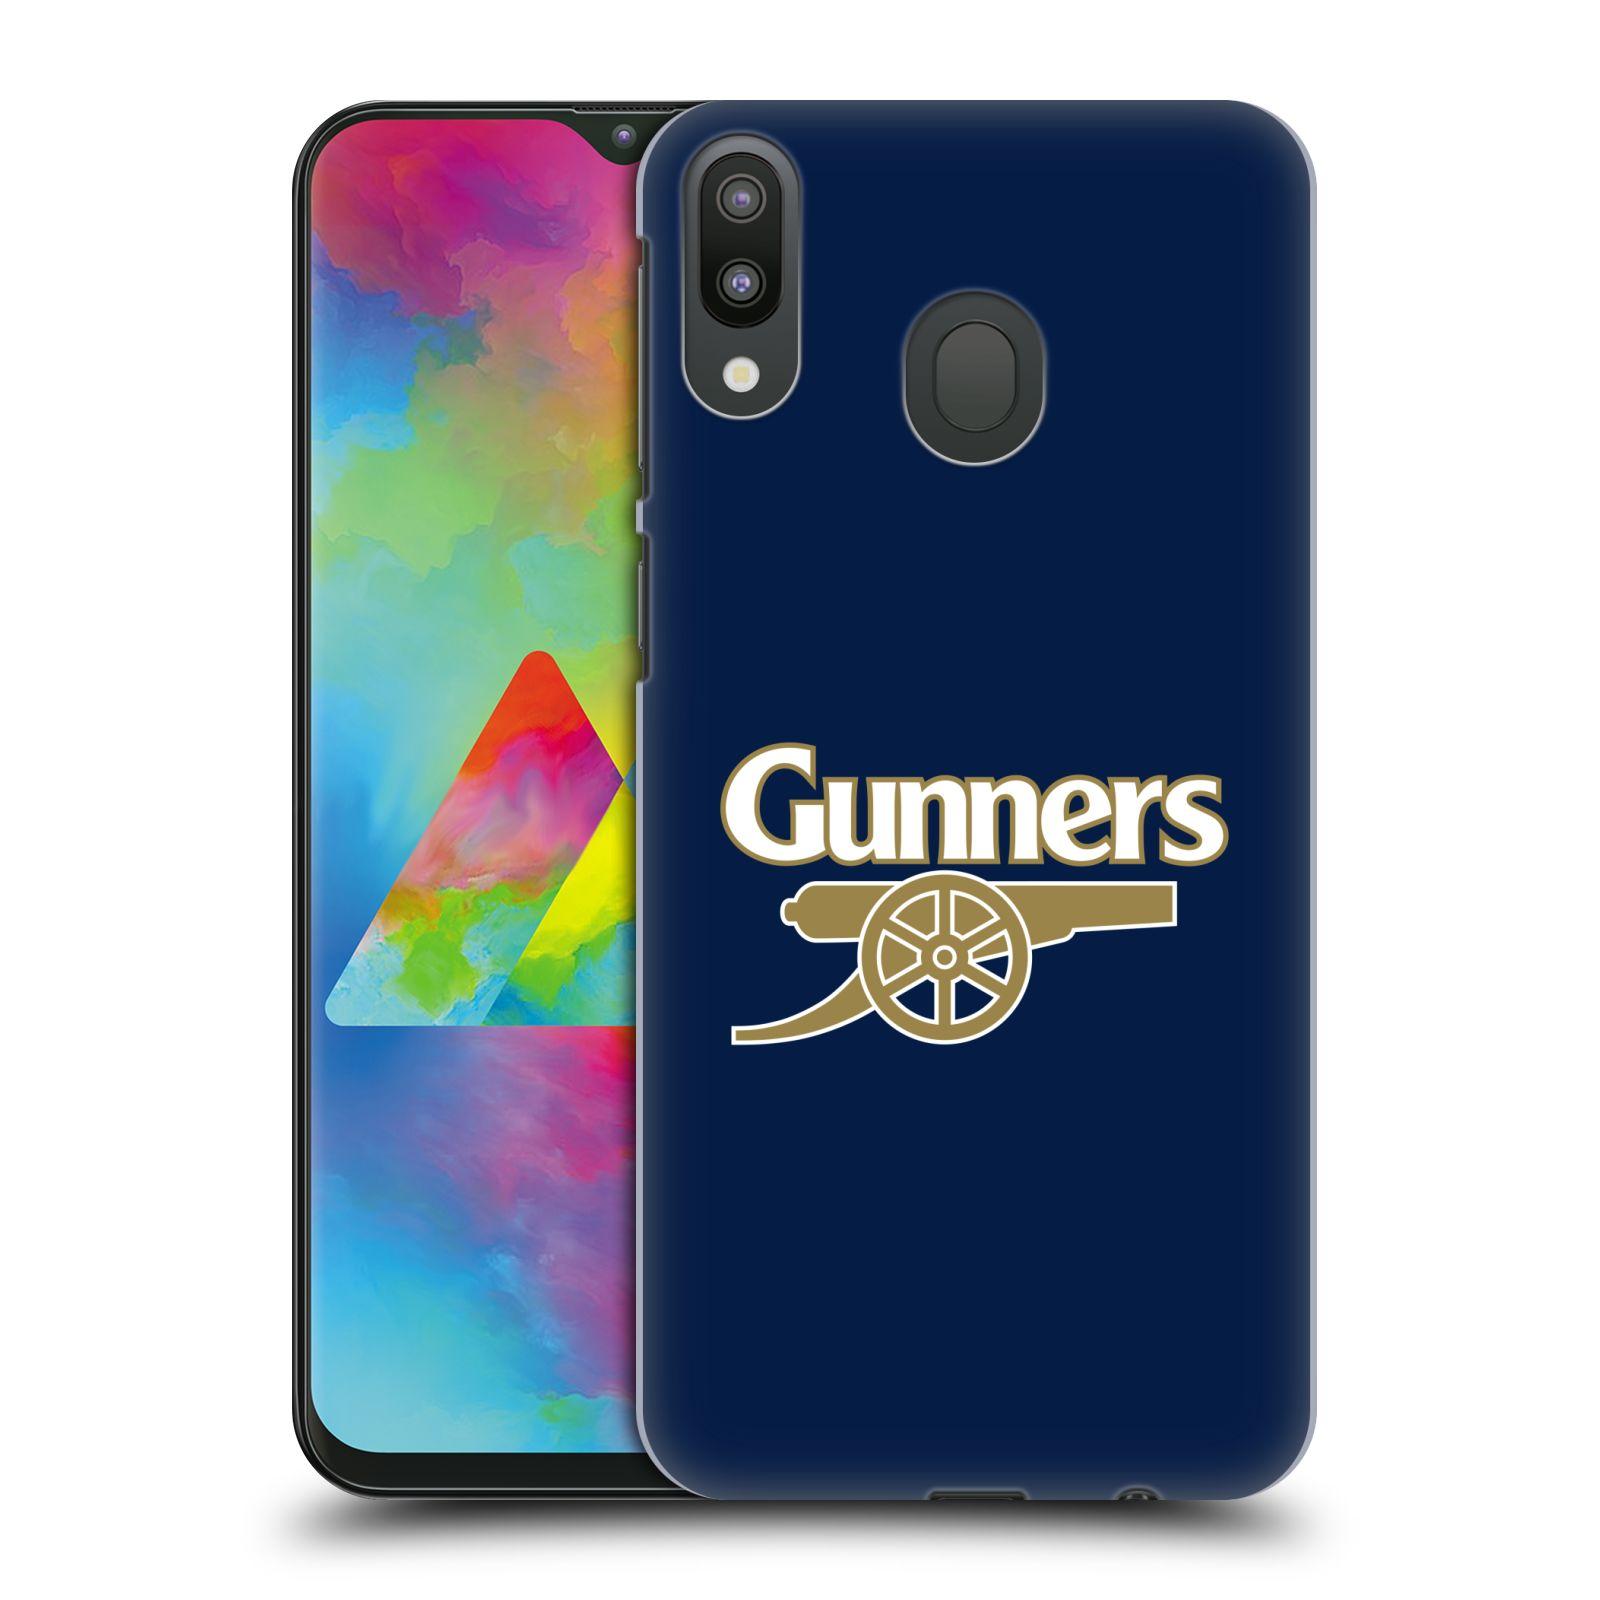 Plastové pouzdro na mobil Samsung Galaxy M20 - Head Case - Arsenal FC - Gunners